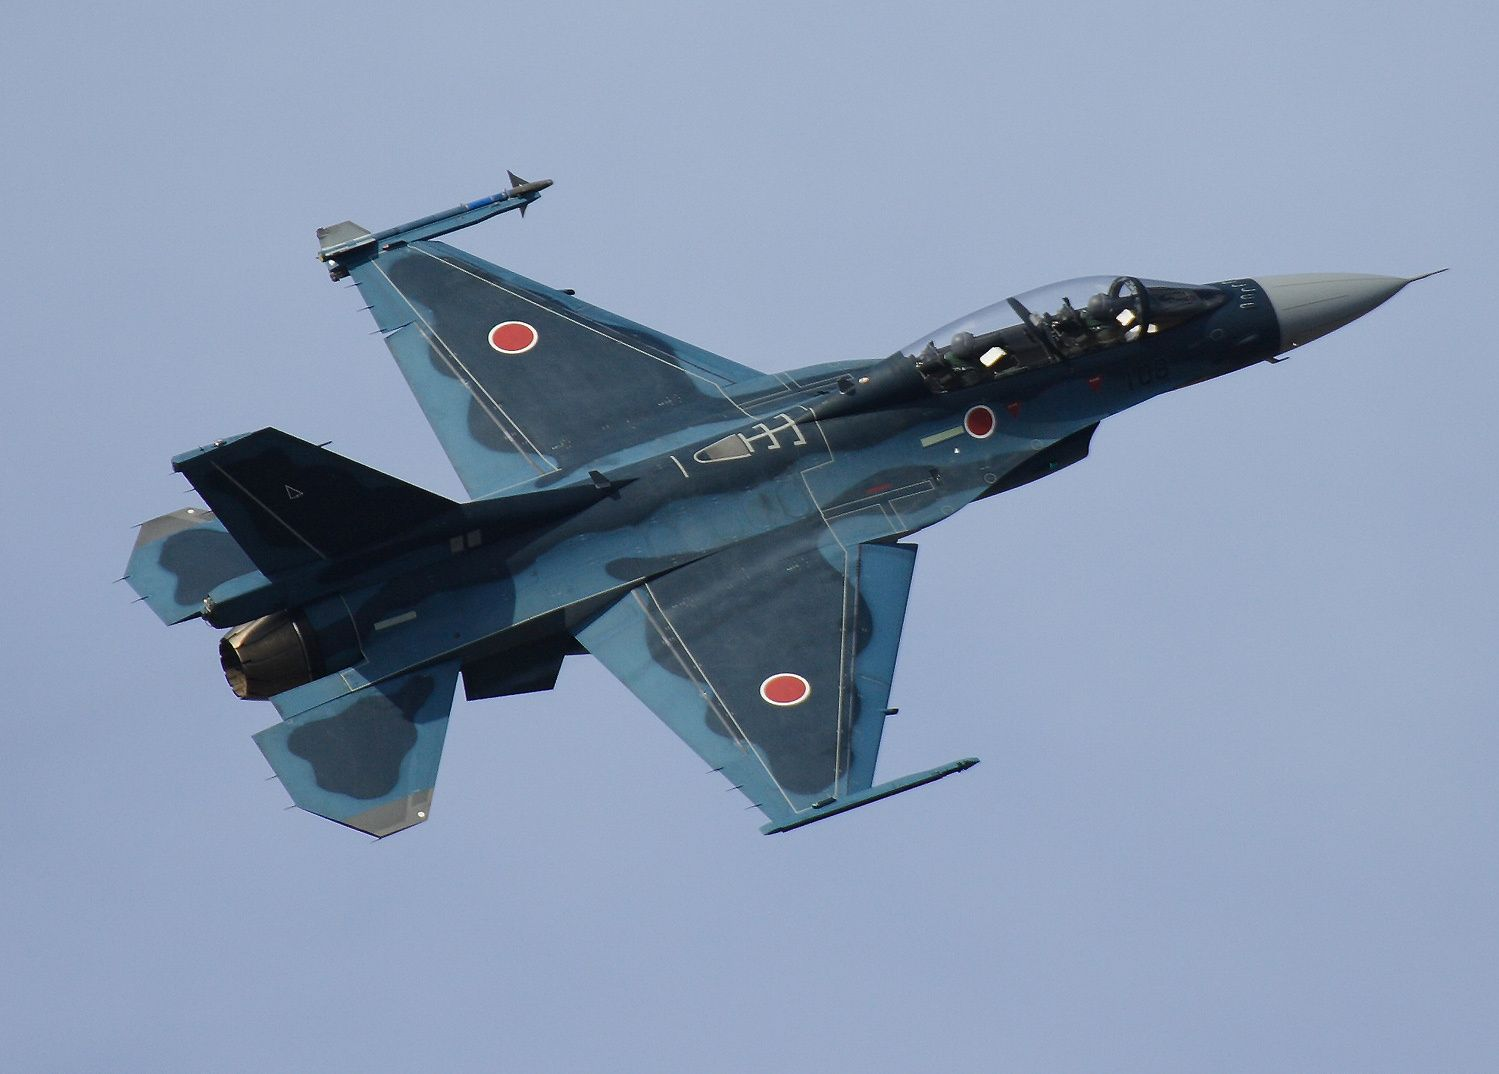 Global War Birds: Mitsubishi F-2